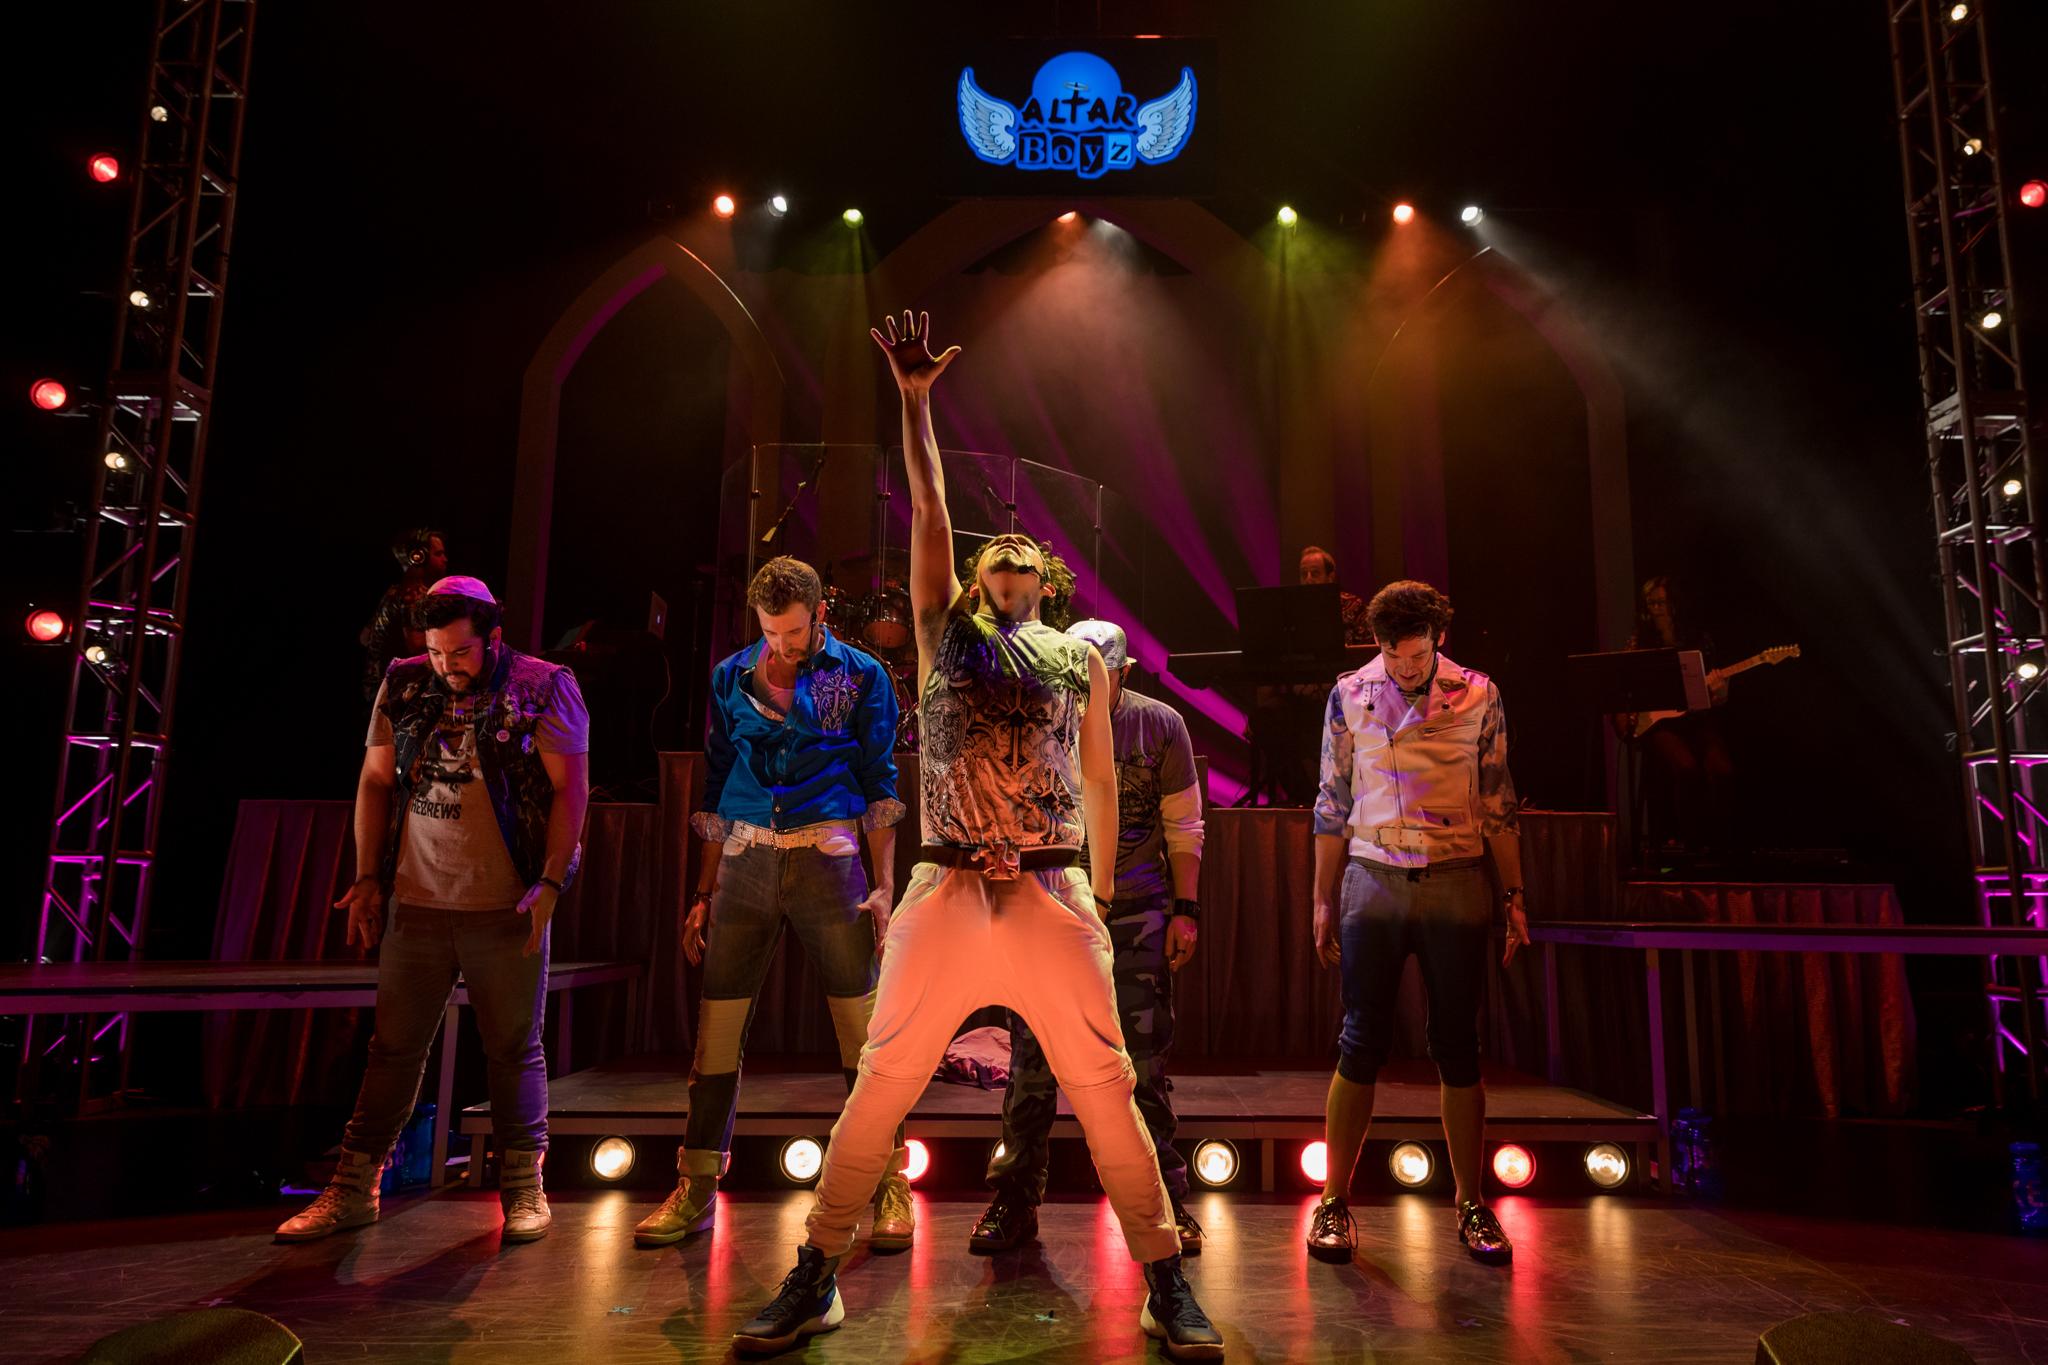 ALTAR BOYZ (Greater Boston Stage Company)